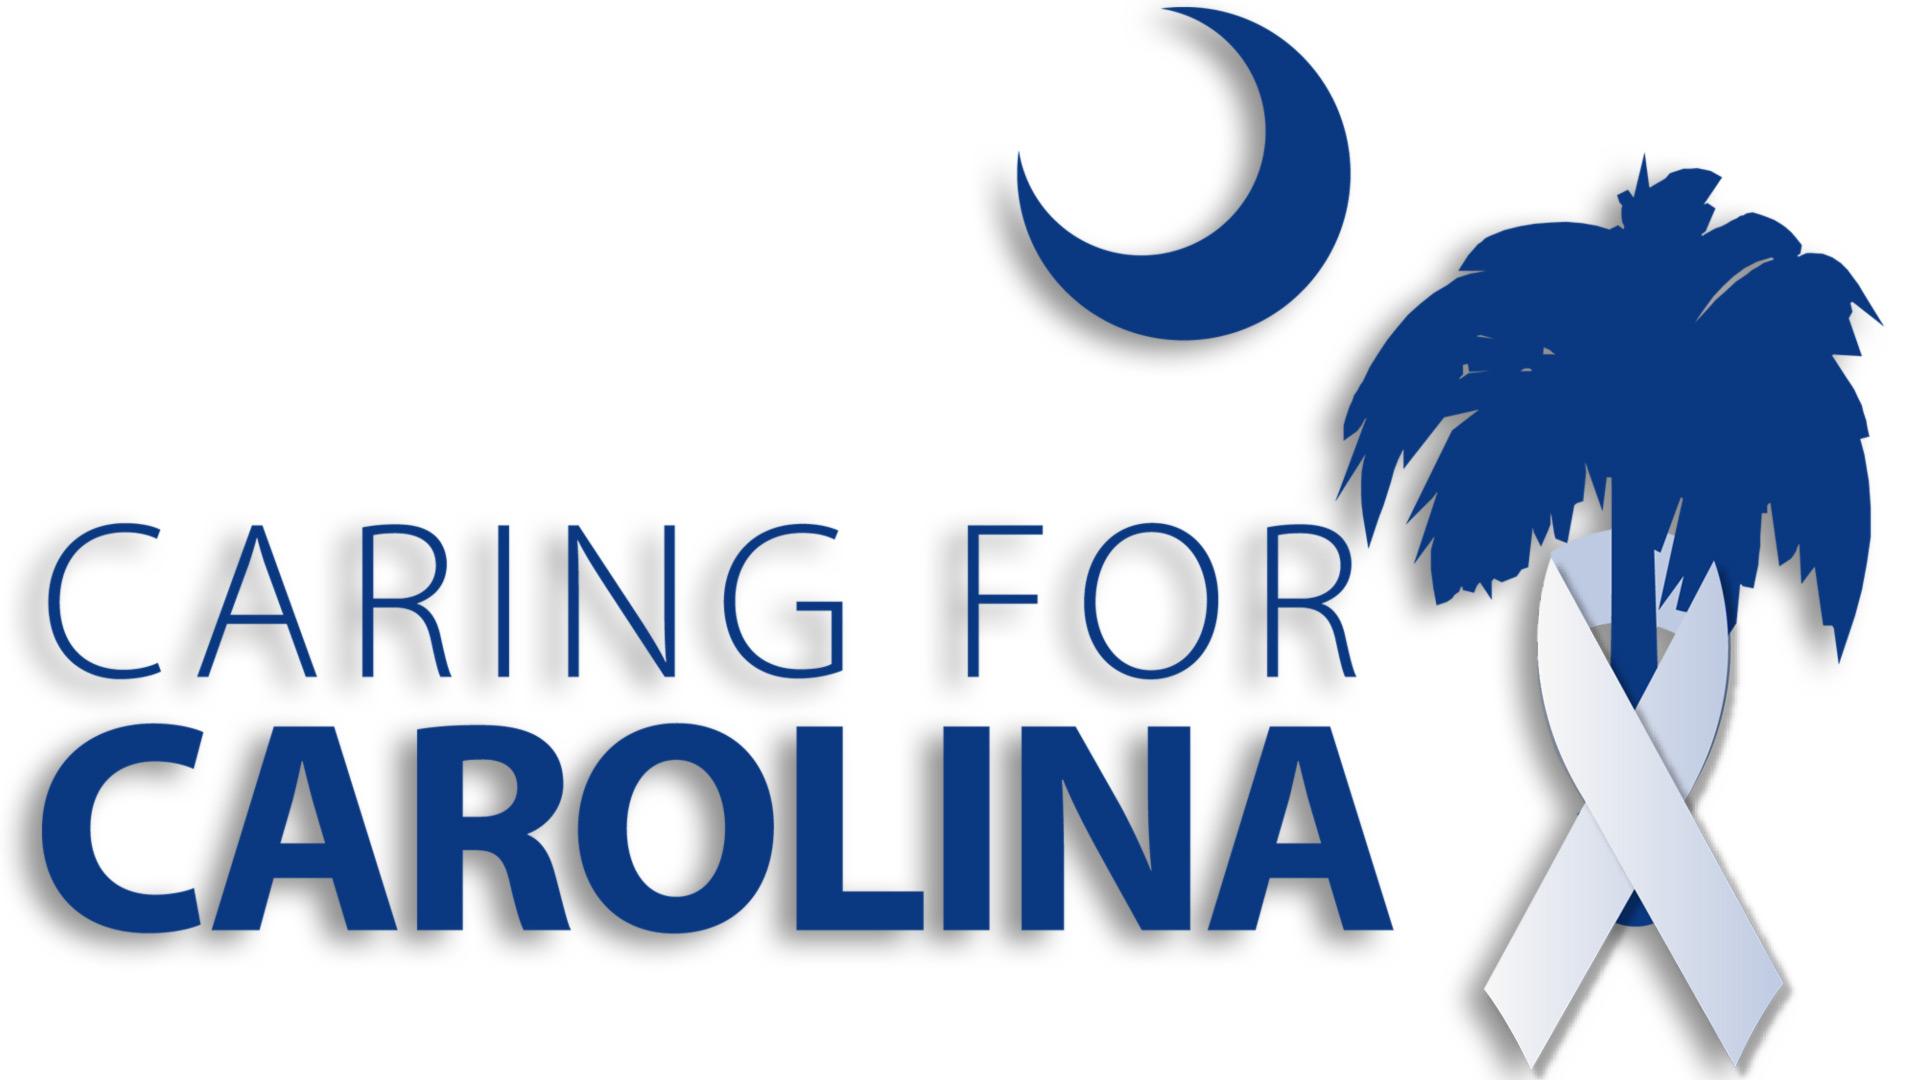 Caring-For-Carolina-Logo_123180